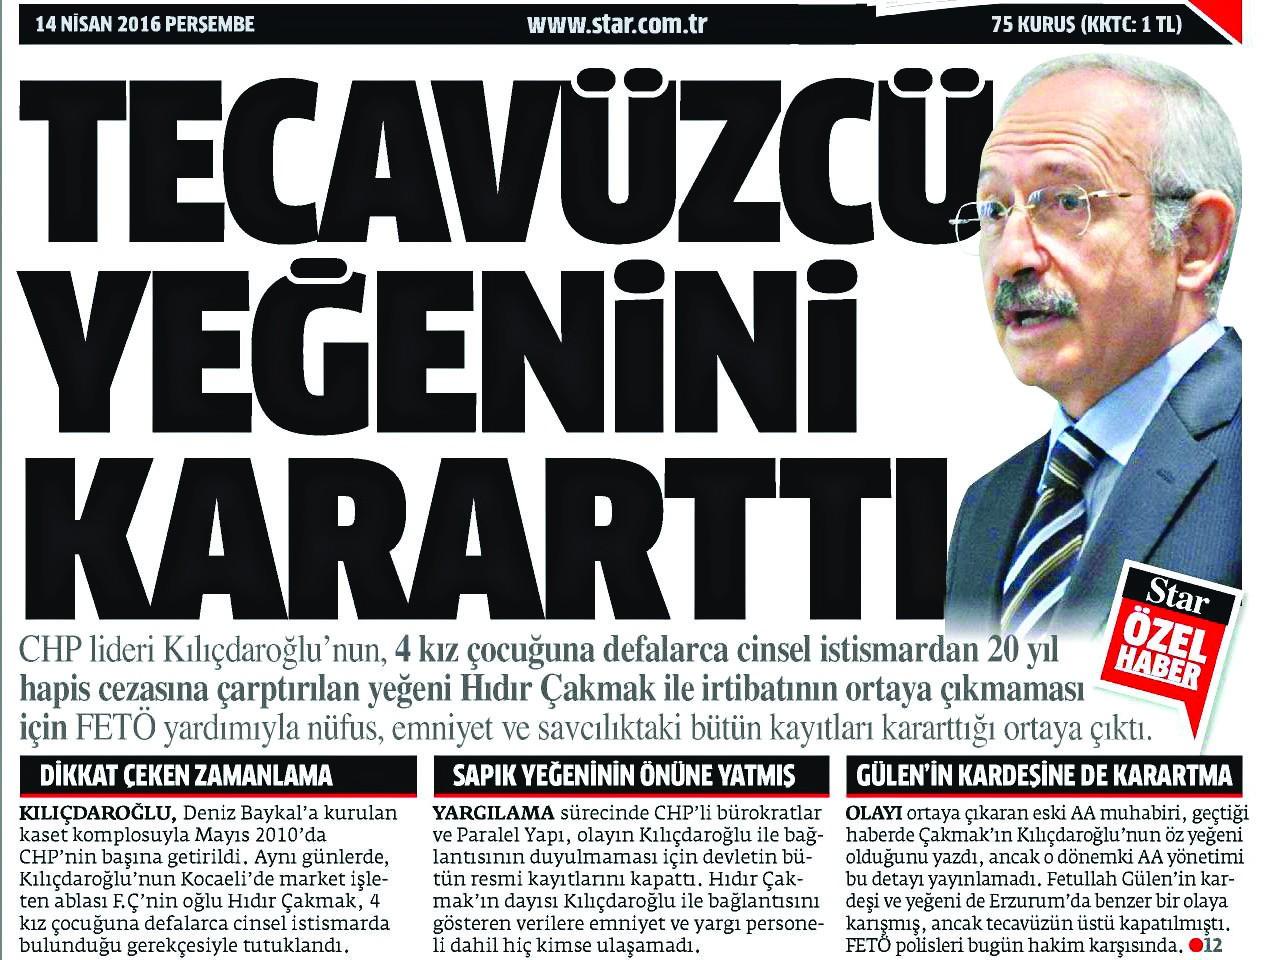 CHP nerede tecavüz orada - Yeni Akit Gazetesi - Haber Ofisi